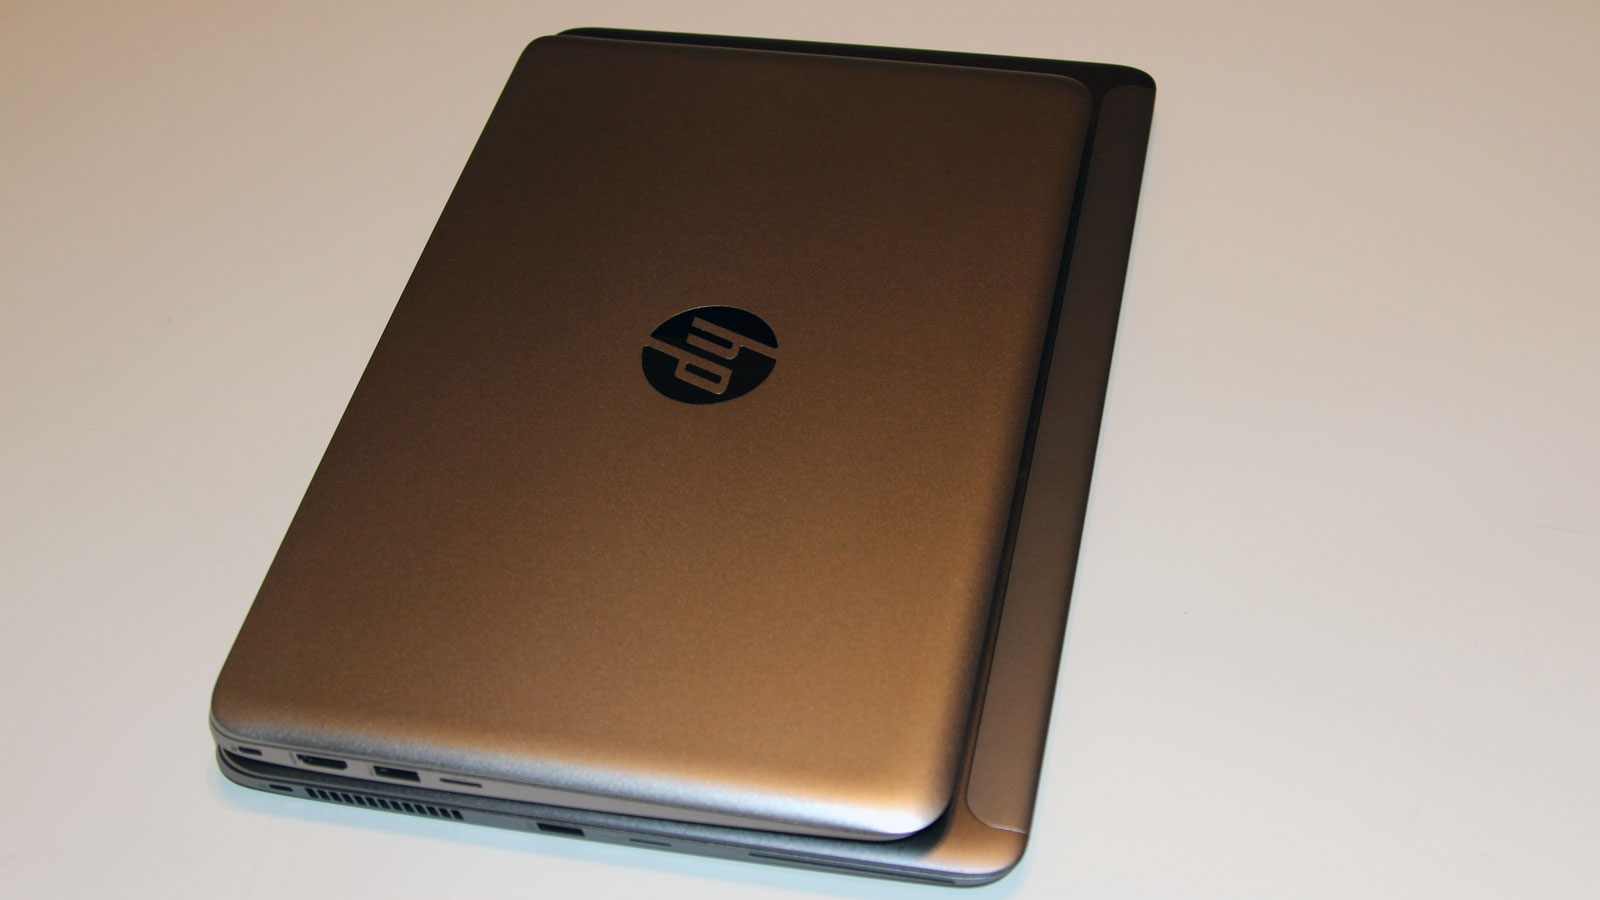 EliteBook 1020 on top of an EliteBook 1040